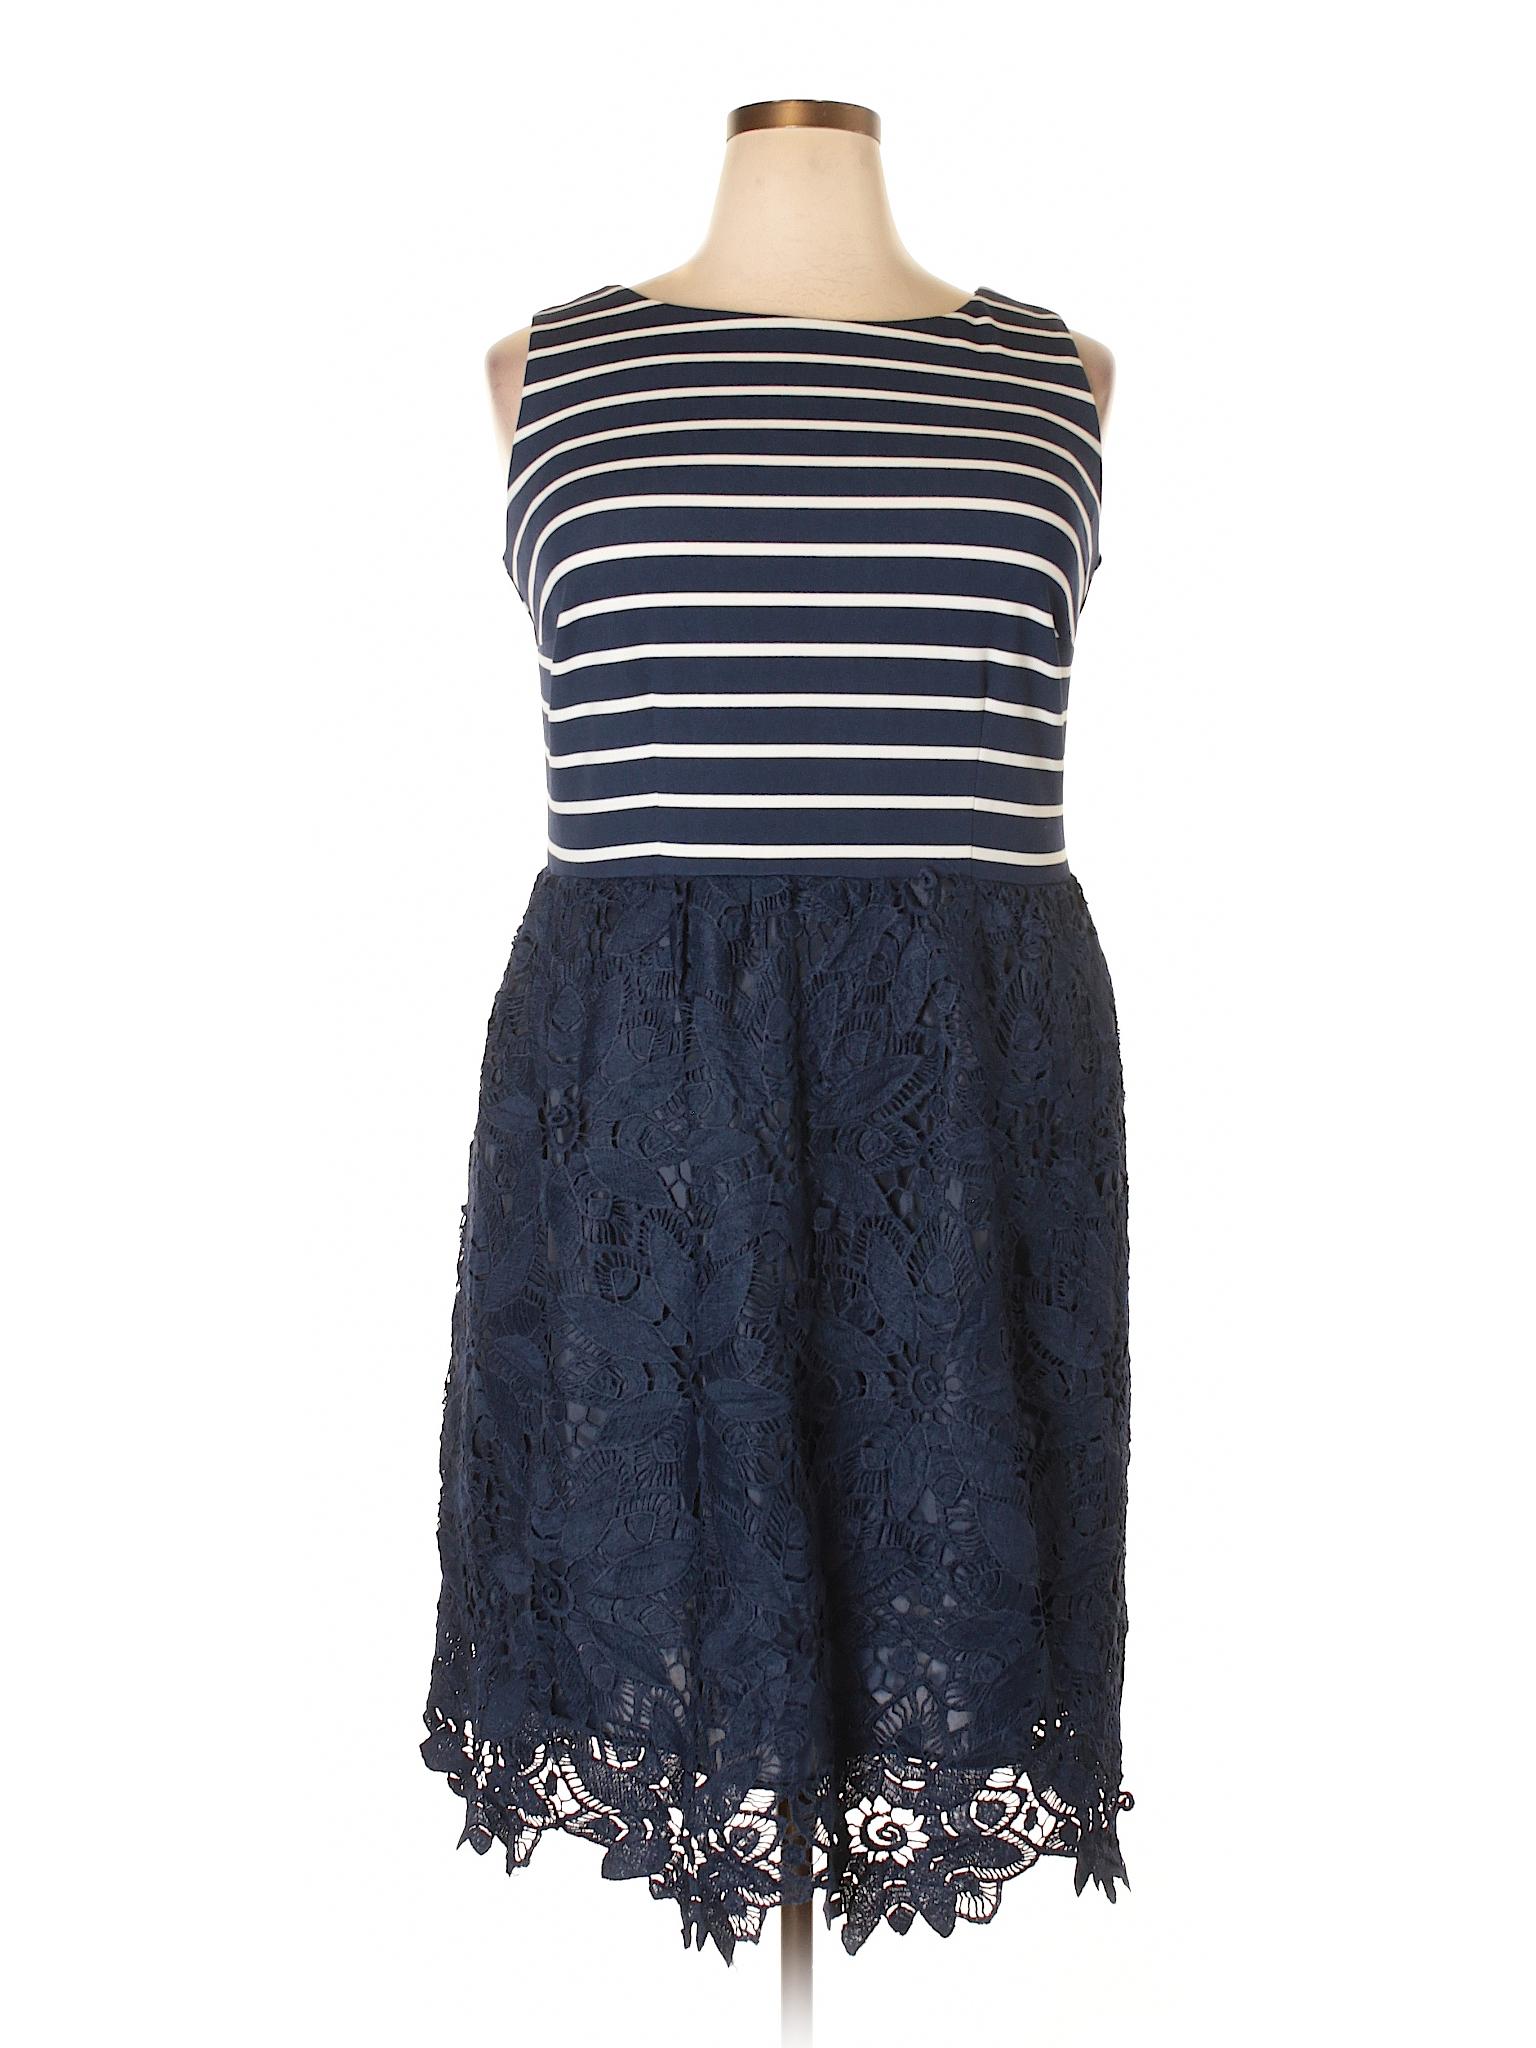 Casual Taylor Taylor Casual Selling Taylor Casual Selling Dress Selling Dress OqZpq8w